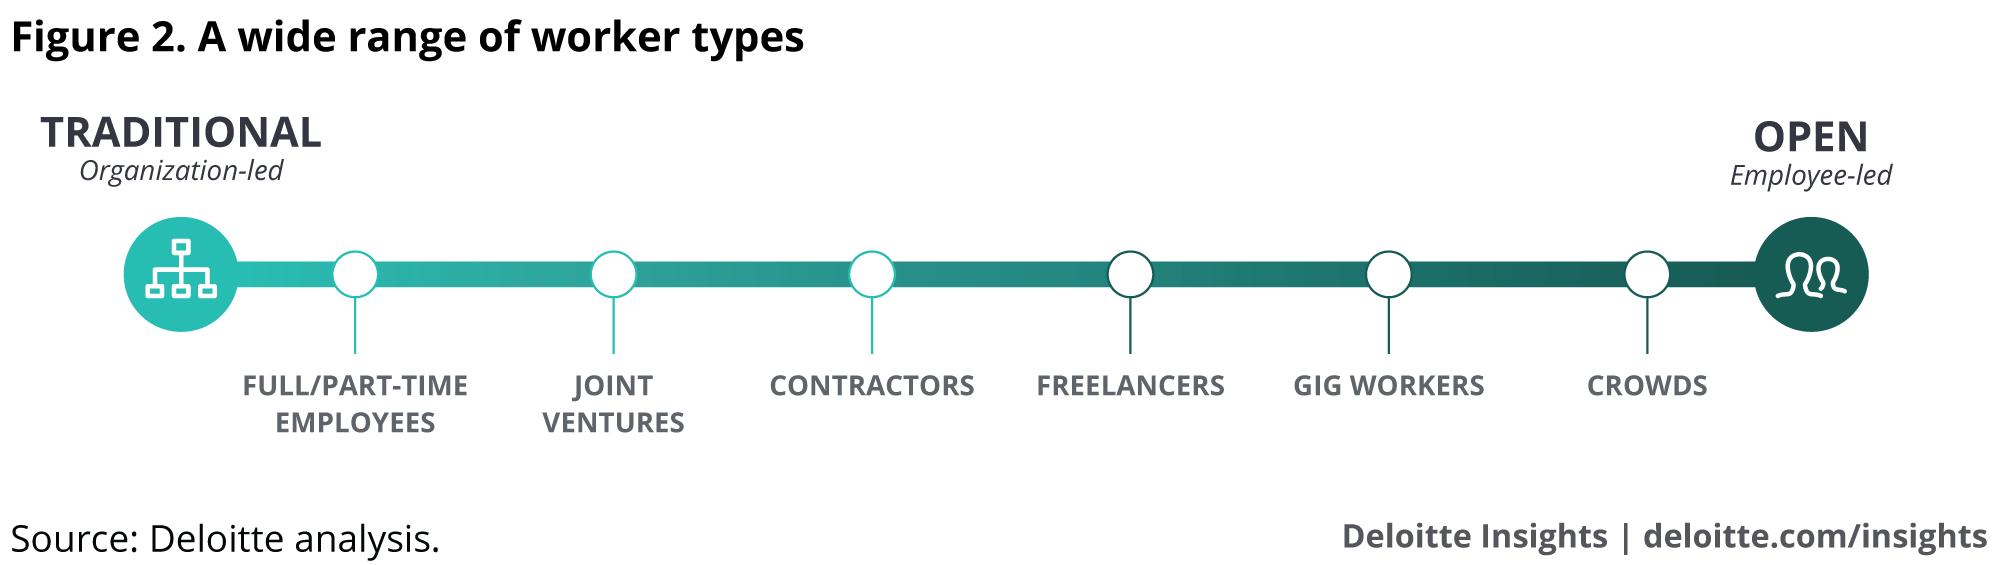 A wide range of worker types